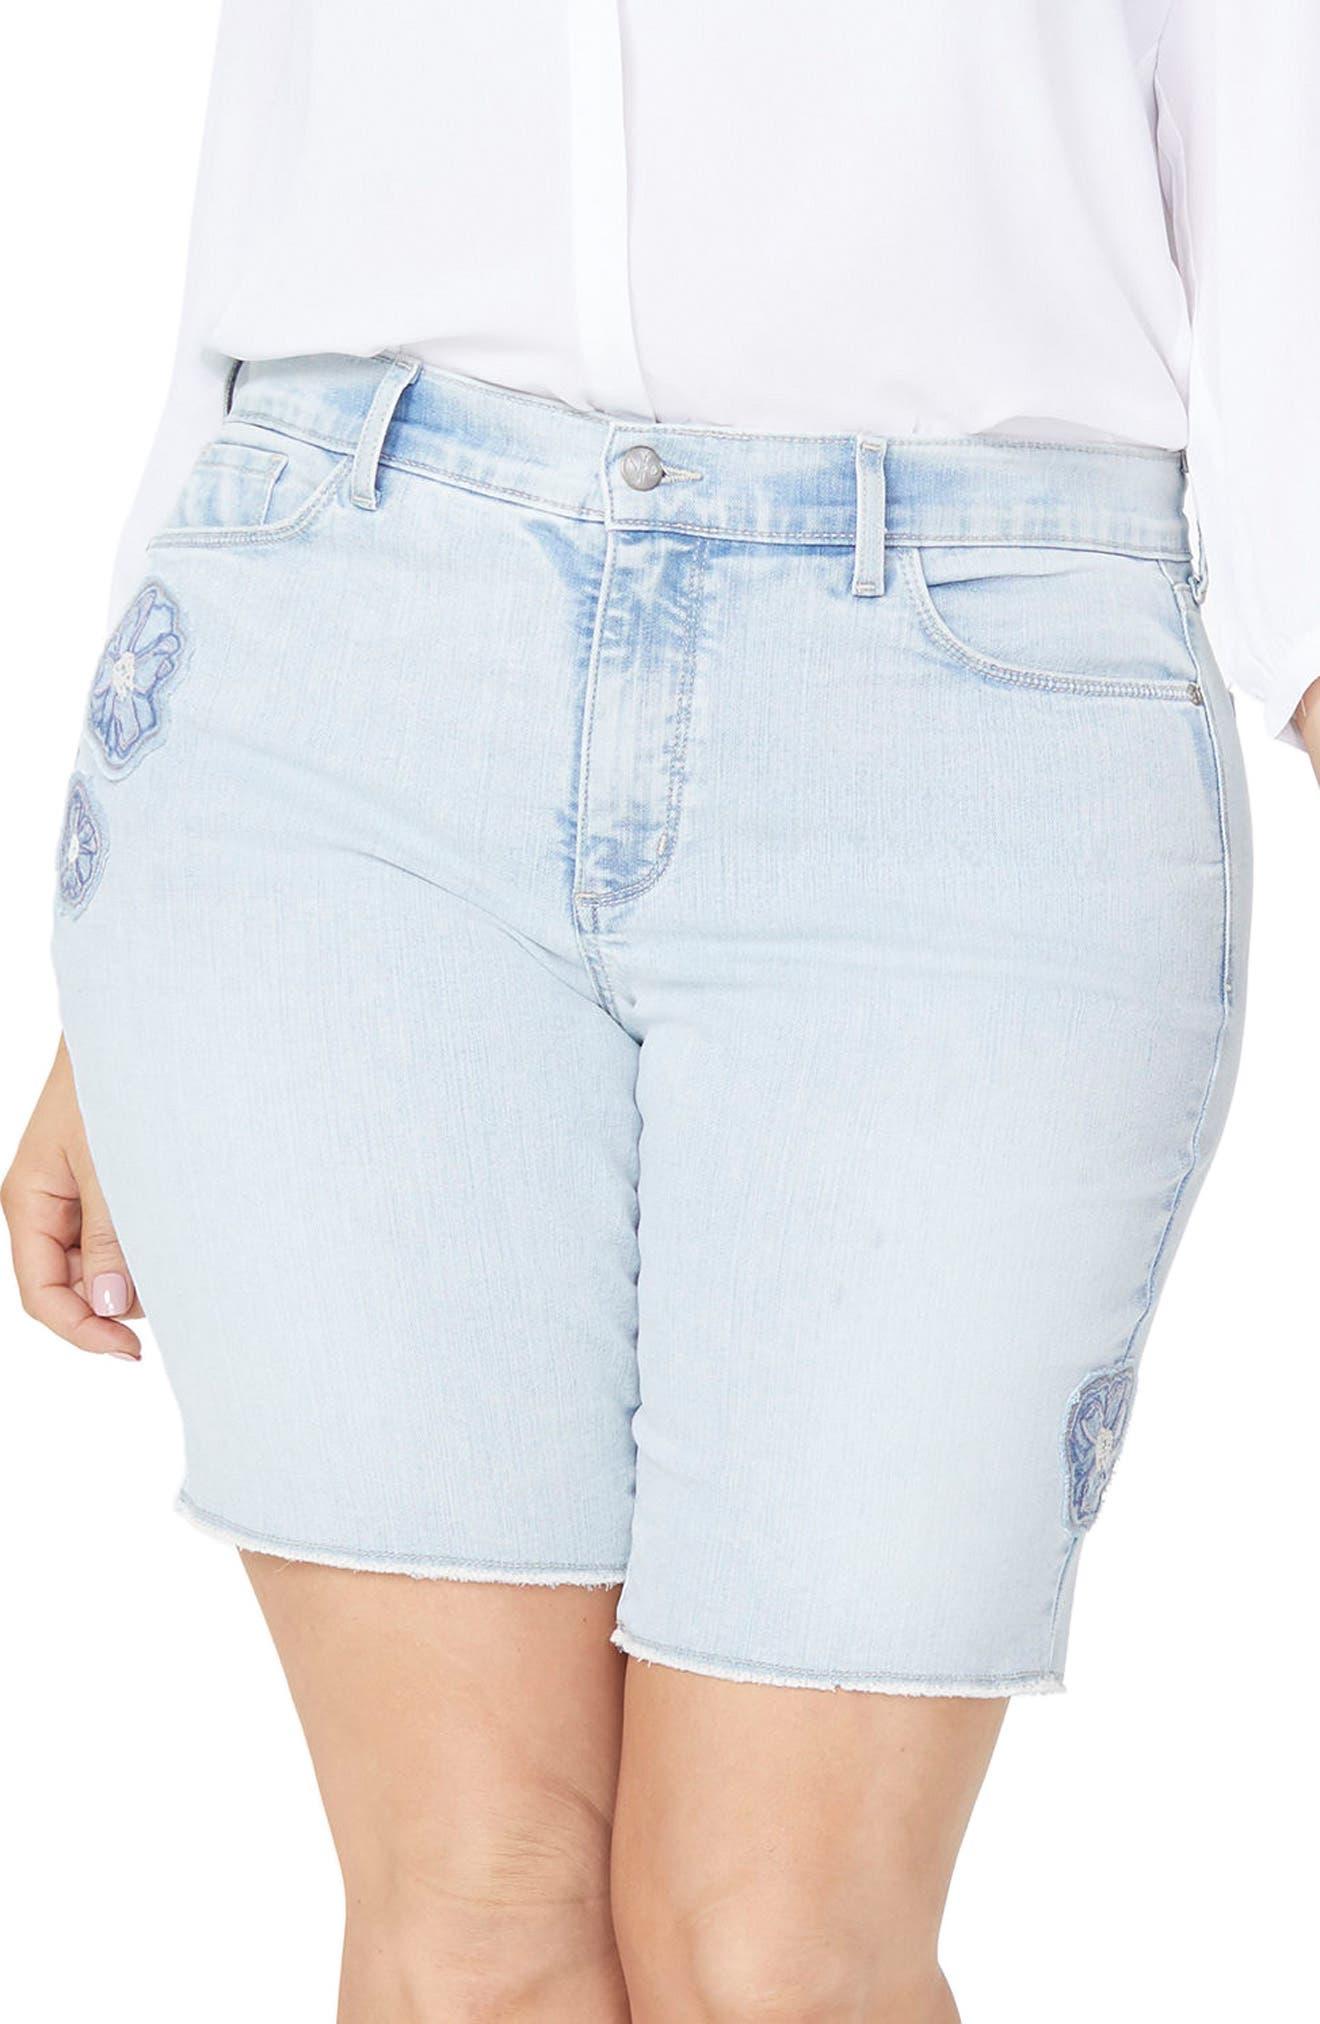 NYDJ Briella Dream Blossom Denim Bermuda Shorts (Plus Size)